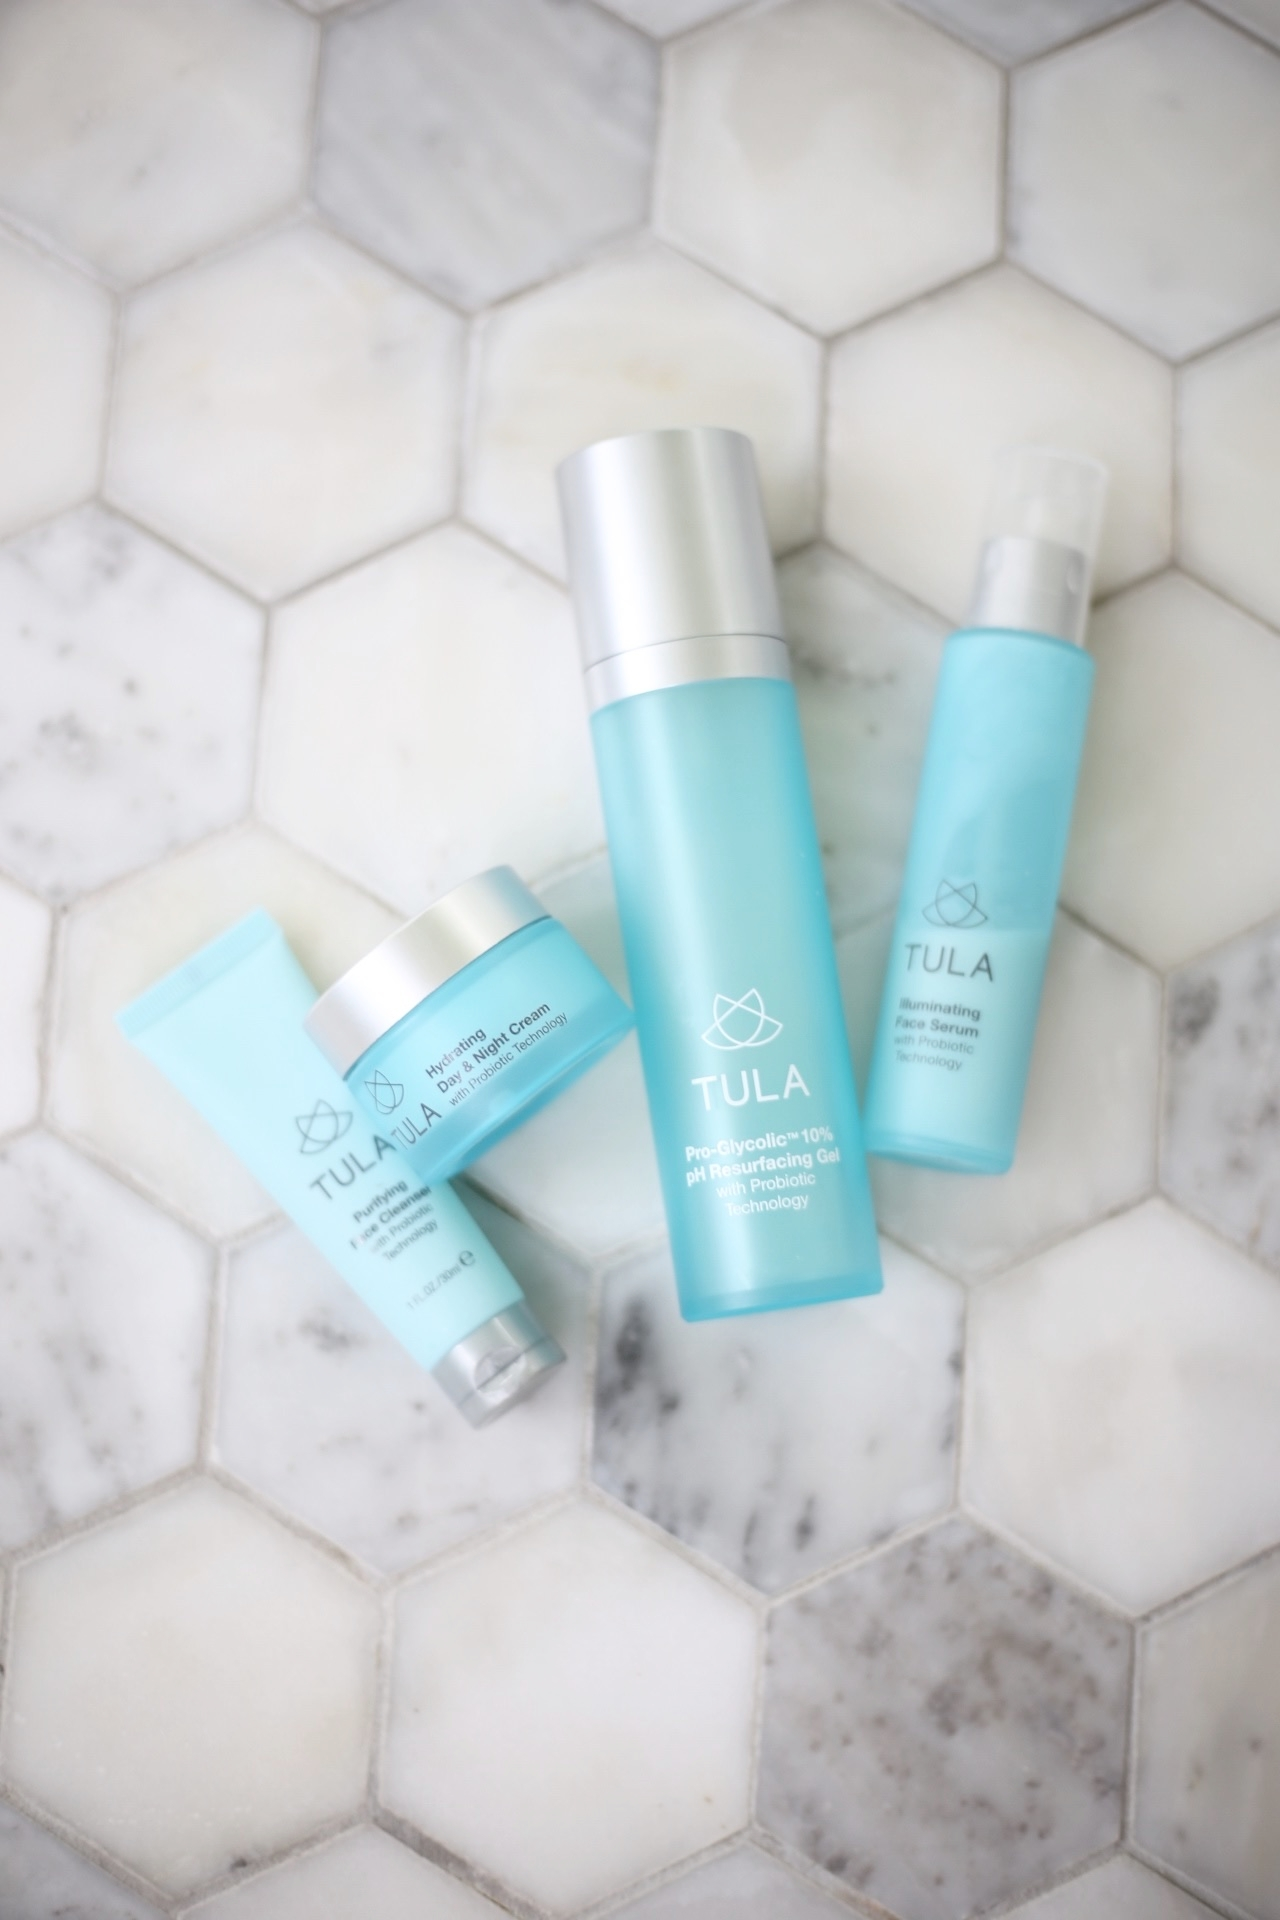 |  cleanser  |  day and night cream  |  pro-glycolic gel  |  illuminating serum  | image Sydney Clawson |